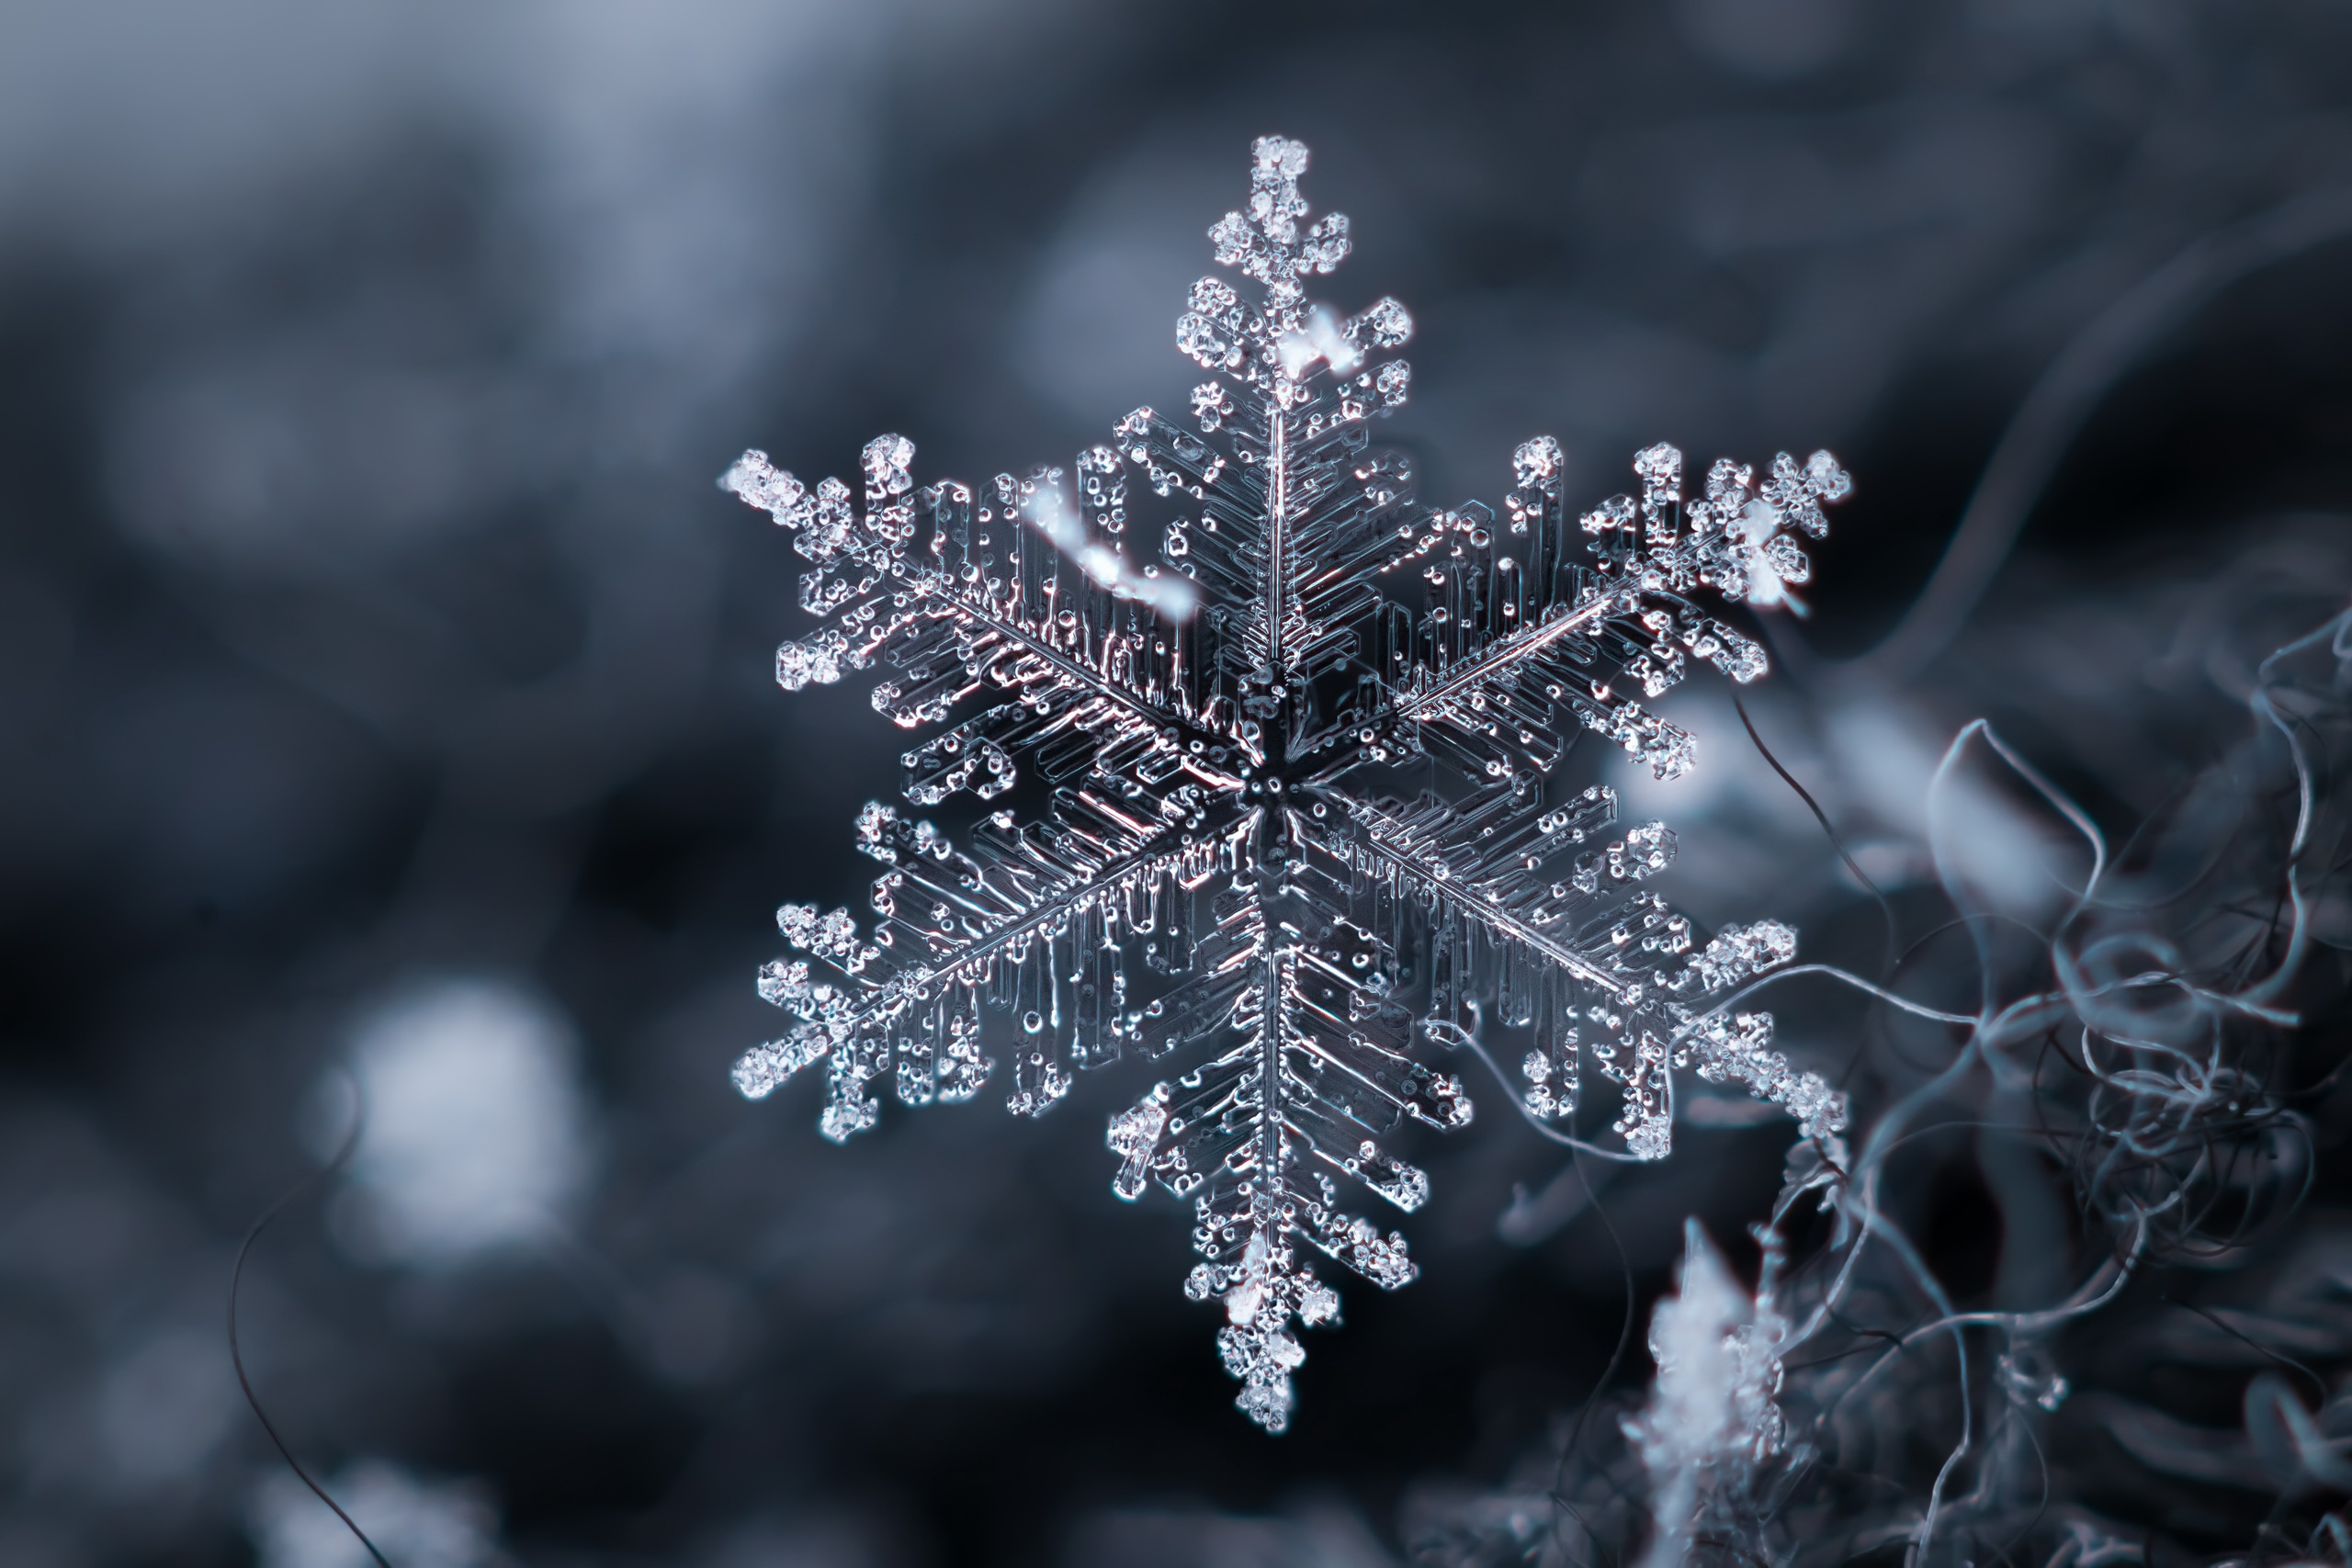 General 2560x1707 nature ice snowflake macro